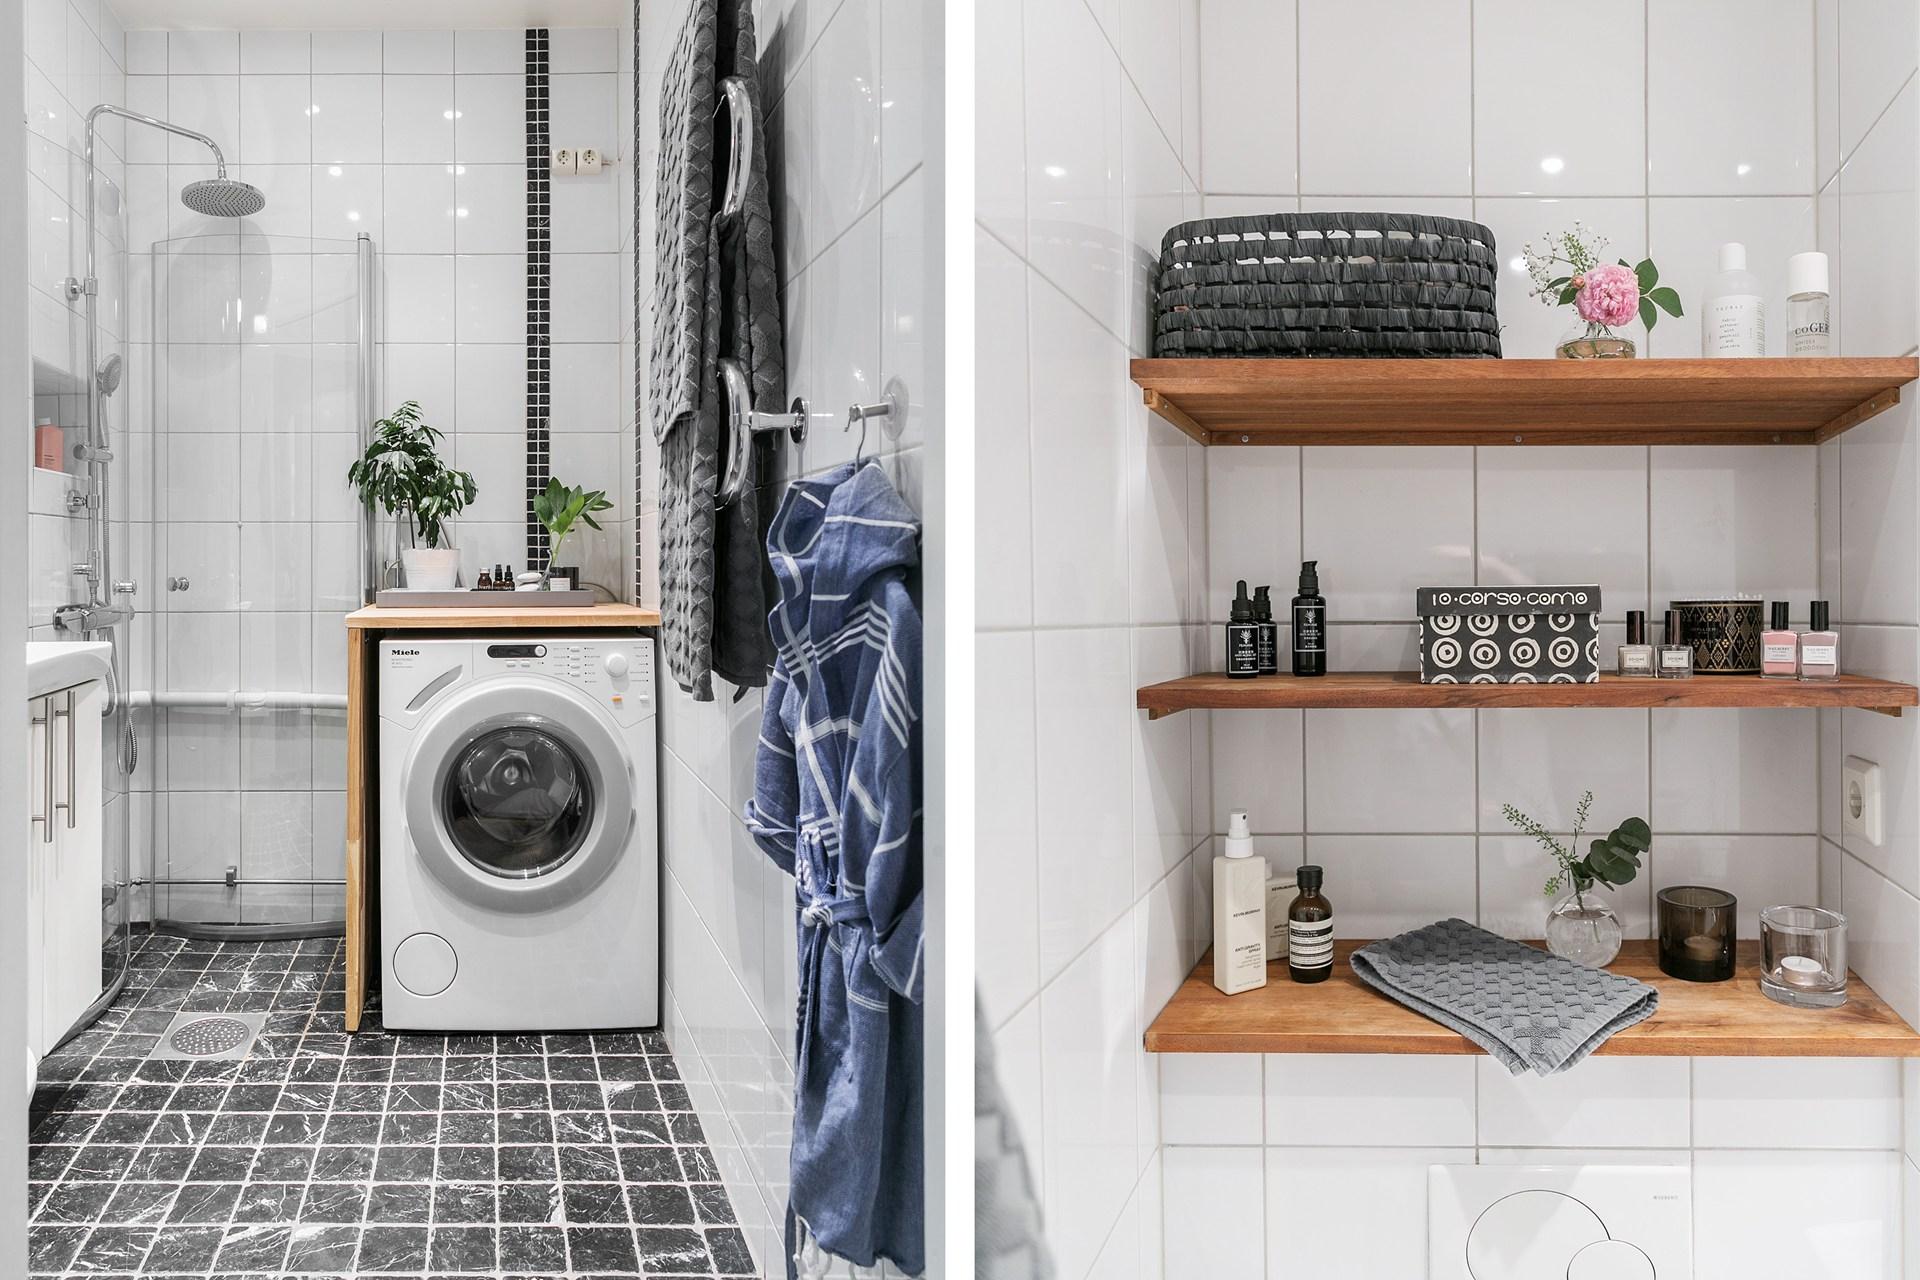 санузел душ раковина зеркало стиральная машина ниша полки